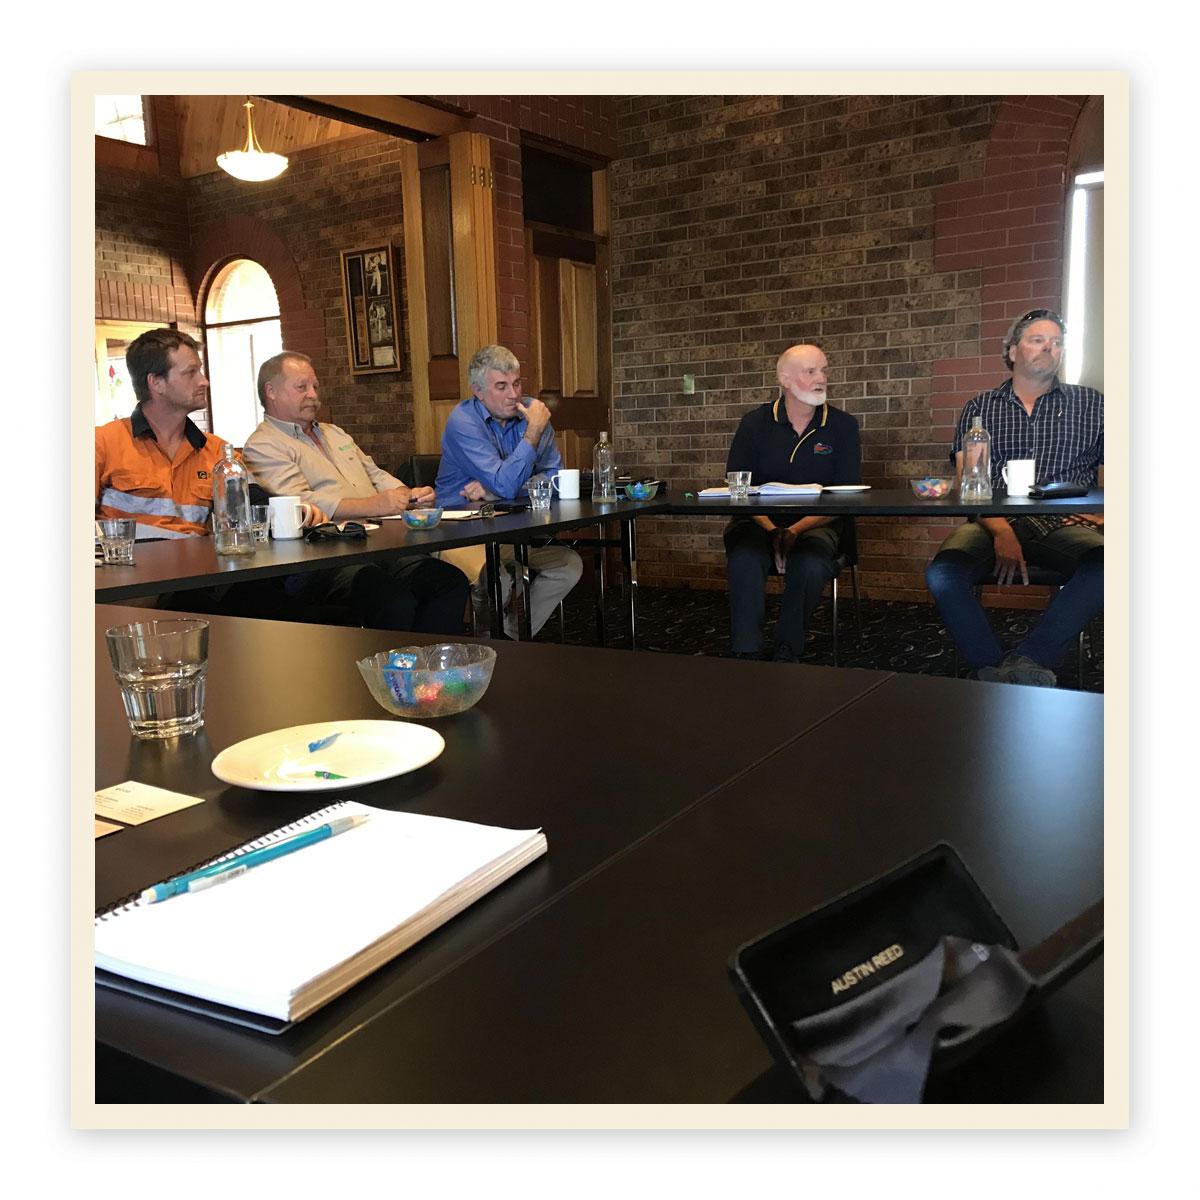 Image of Industrial Hemp Industrial Hemp Project National Cultivator Trial Scheme meeting